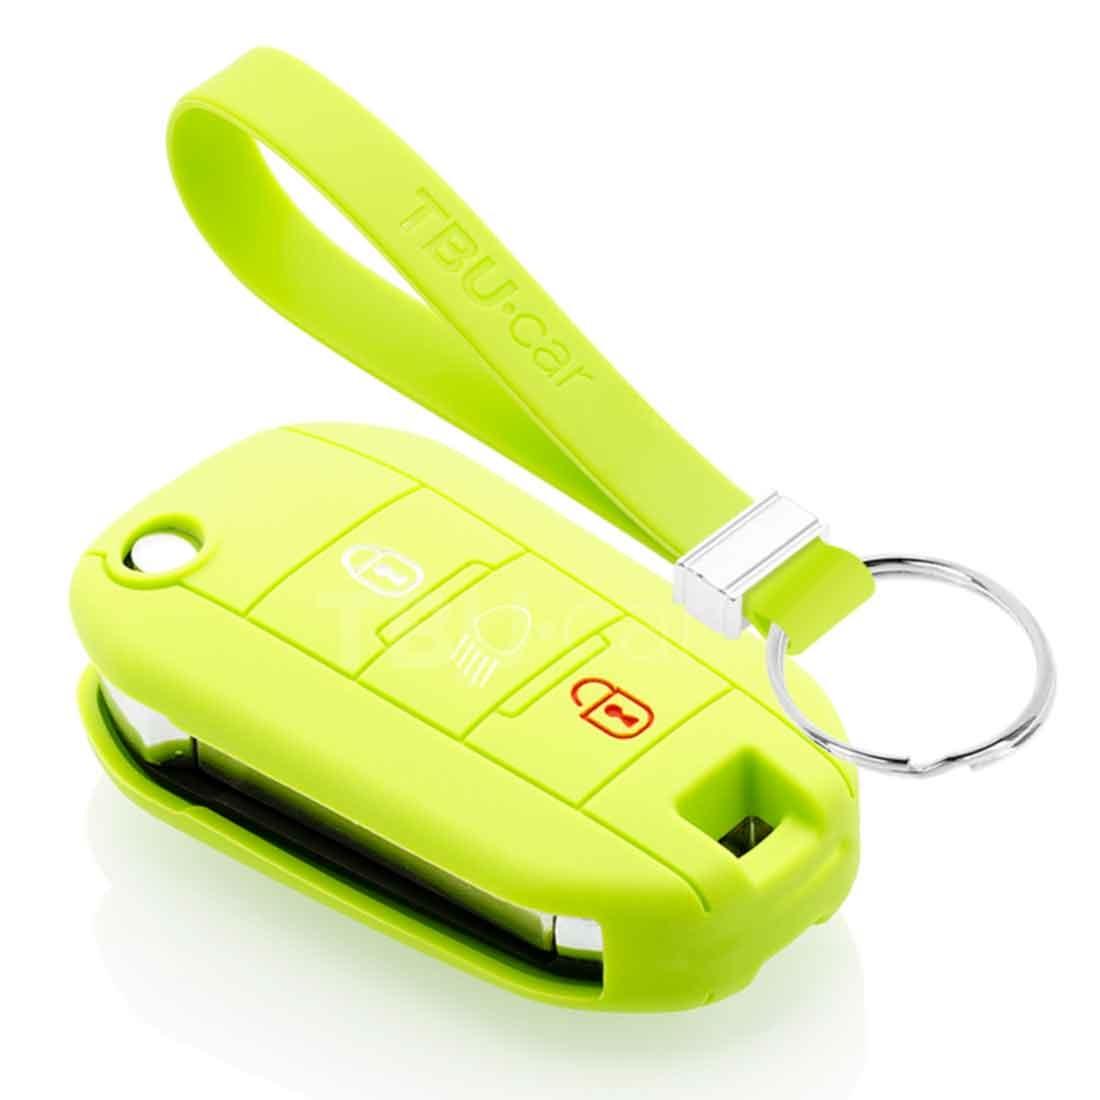 TBU car TBU car Autoschlüssel Hülle kompatibel mit Citroën 3 Tasten (Licht Taste) - Schutzhülle aus Silikon - Auto Schlüsselhülle Cover in Lindgrün